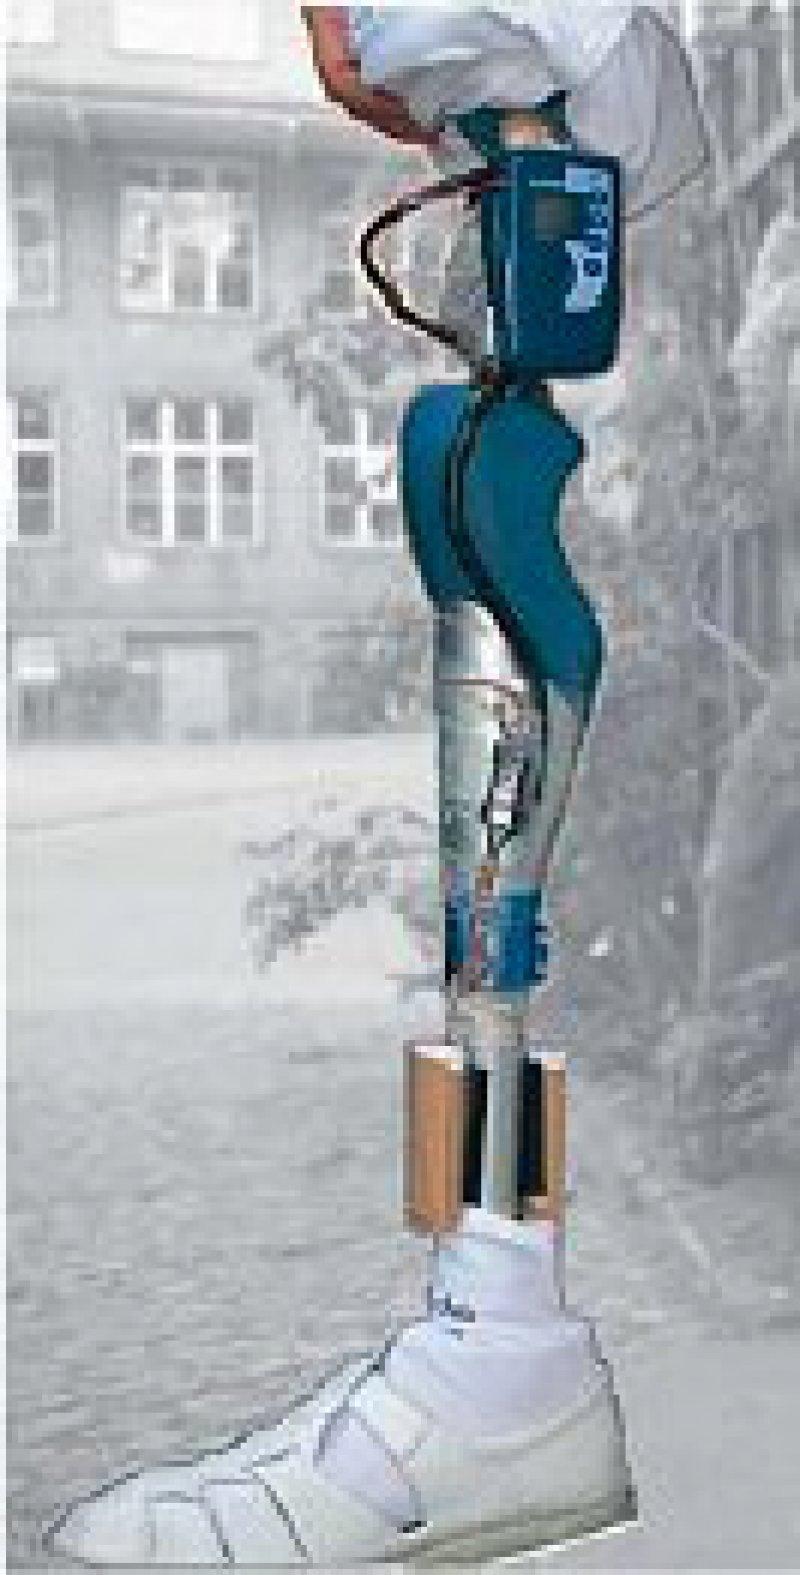 Das Messsystem ist in die Prothese integriert. Foto: TU Berlin/FG Medizintechnik